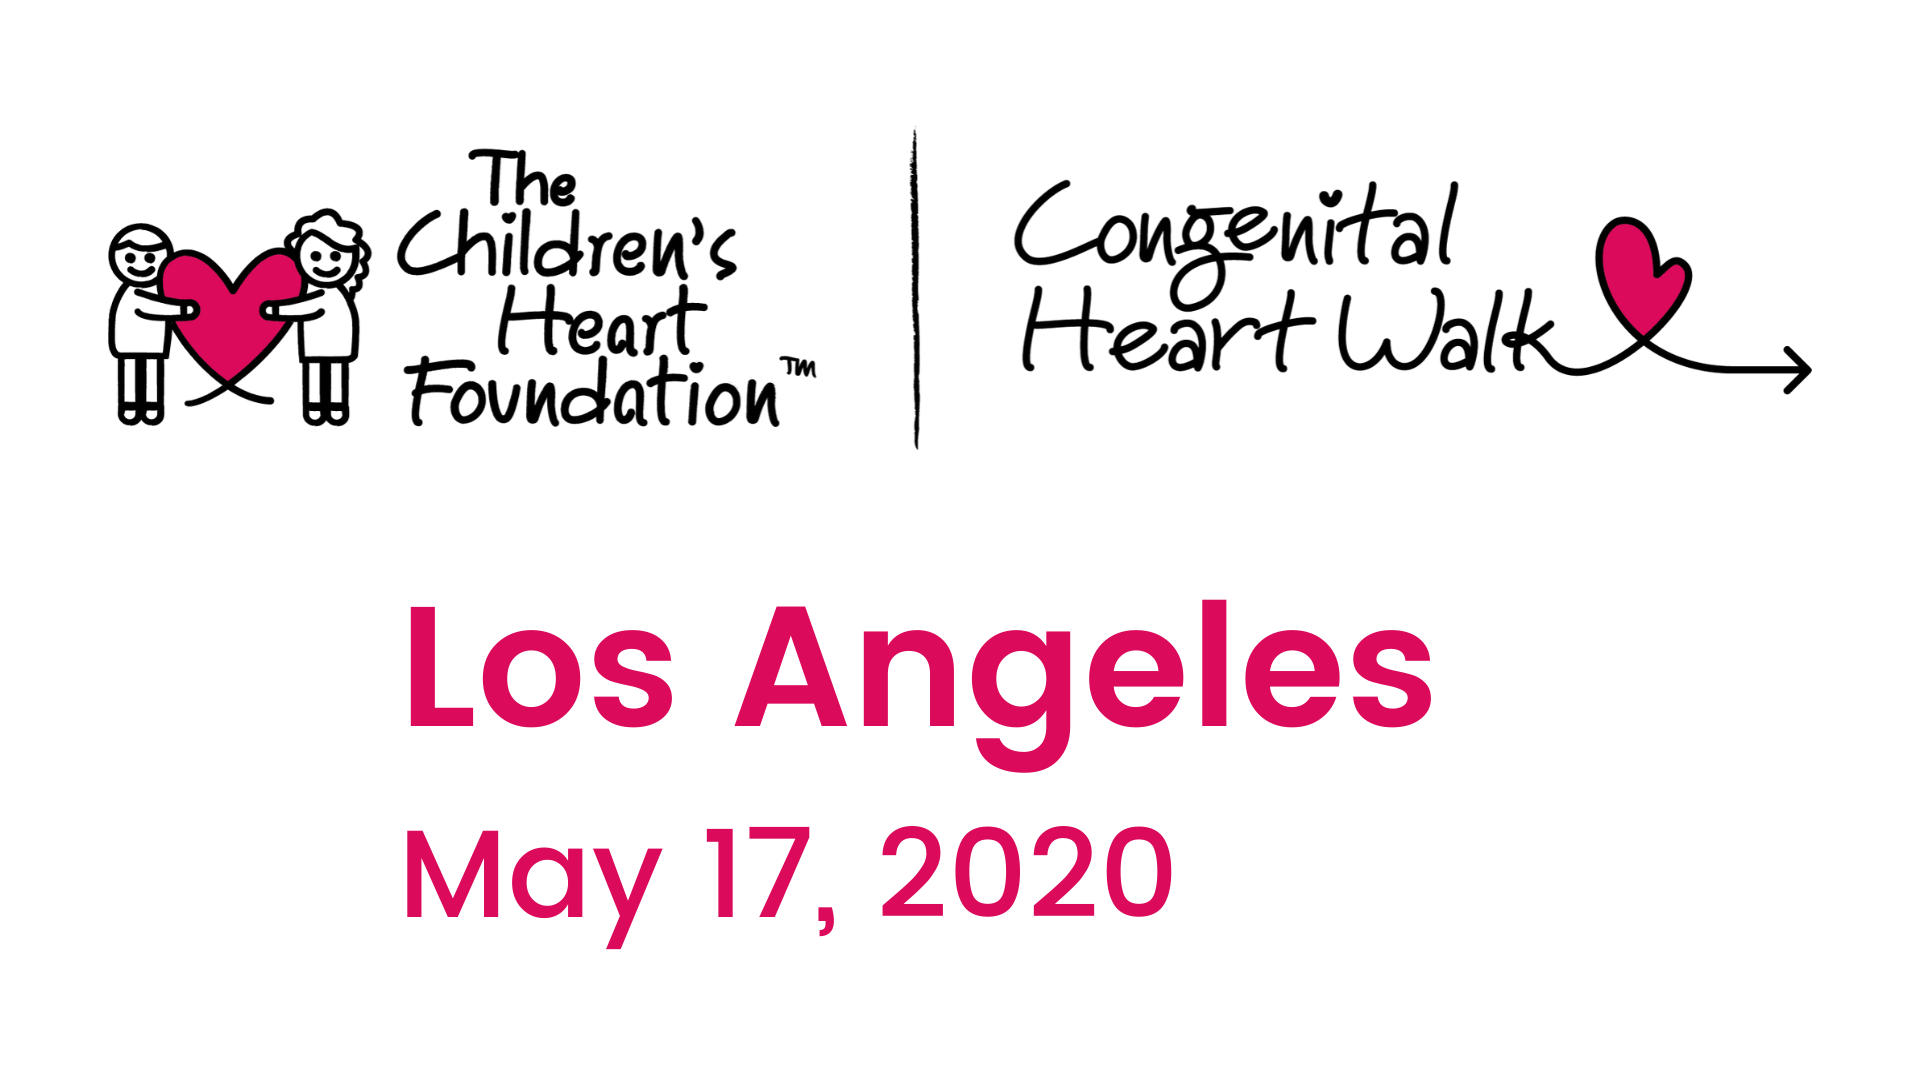 Los Angeles Congenital Heart Walk (California)